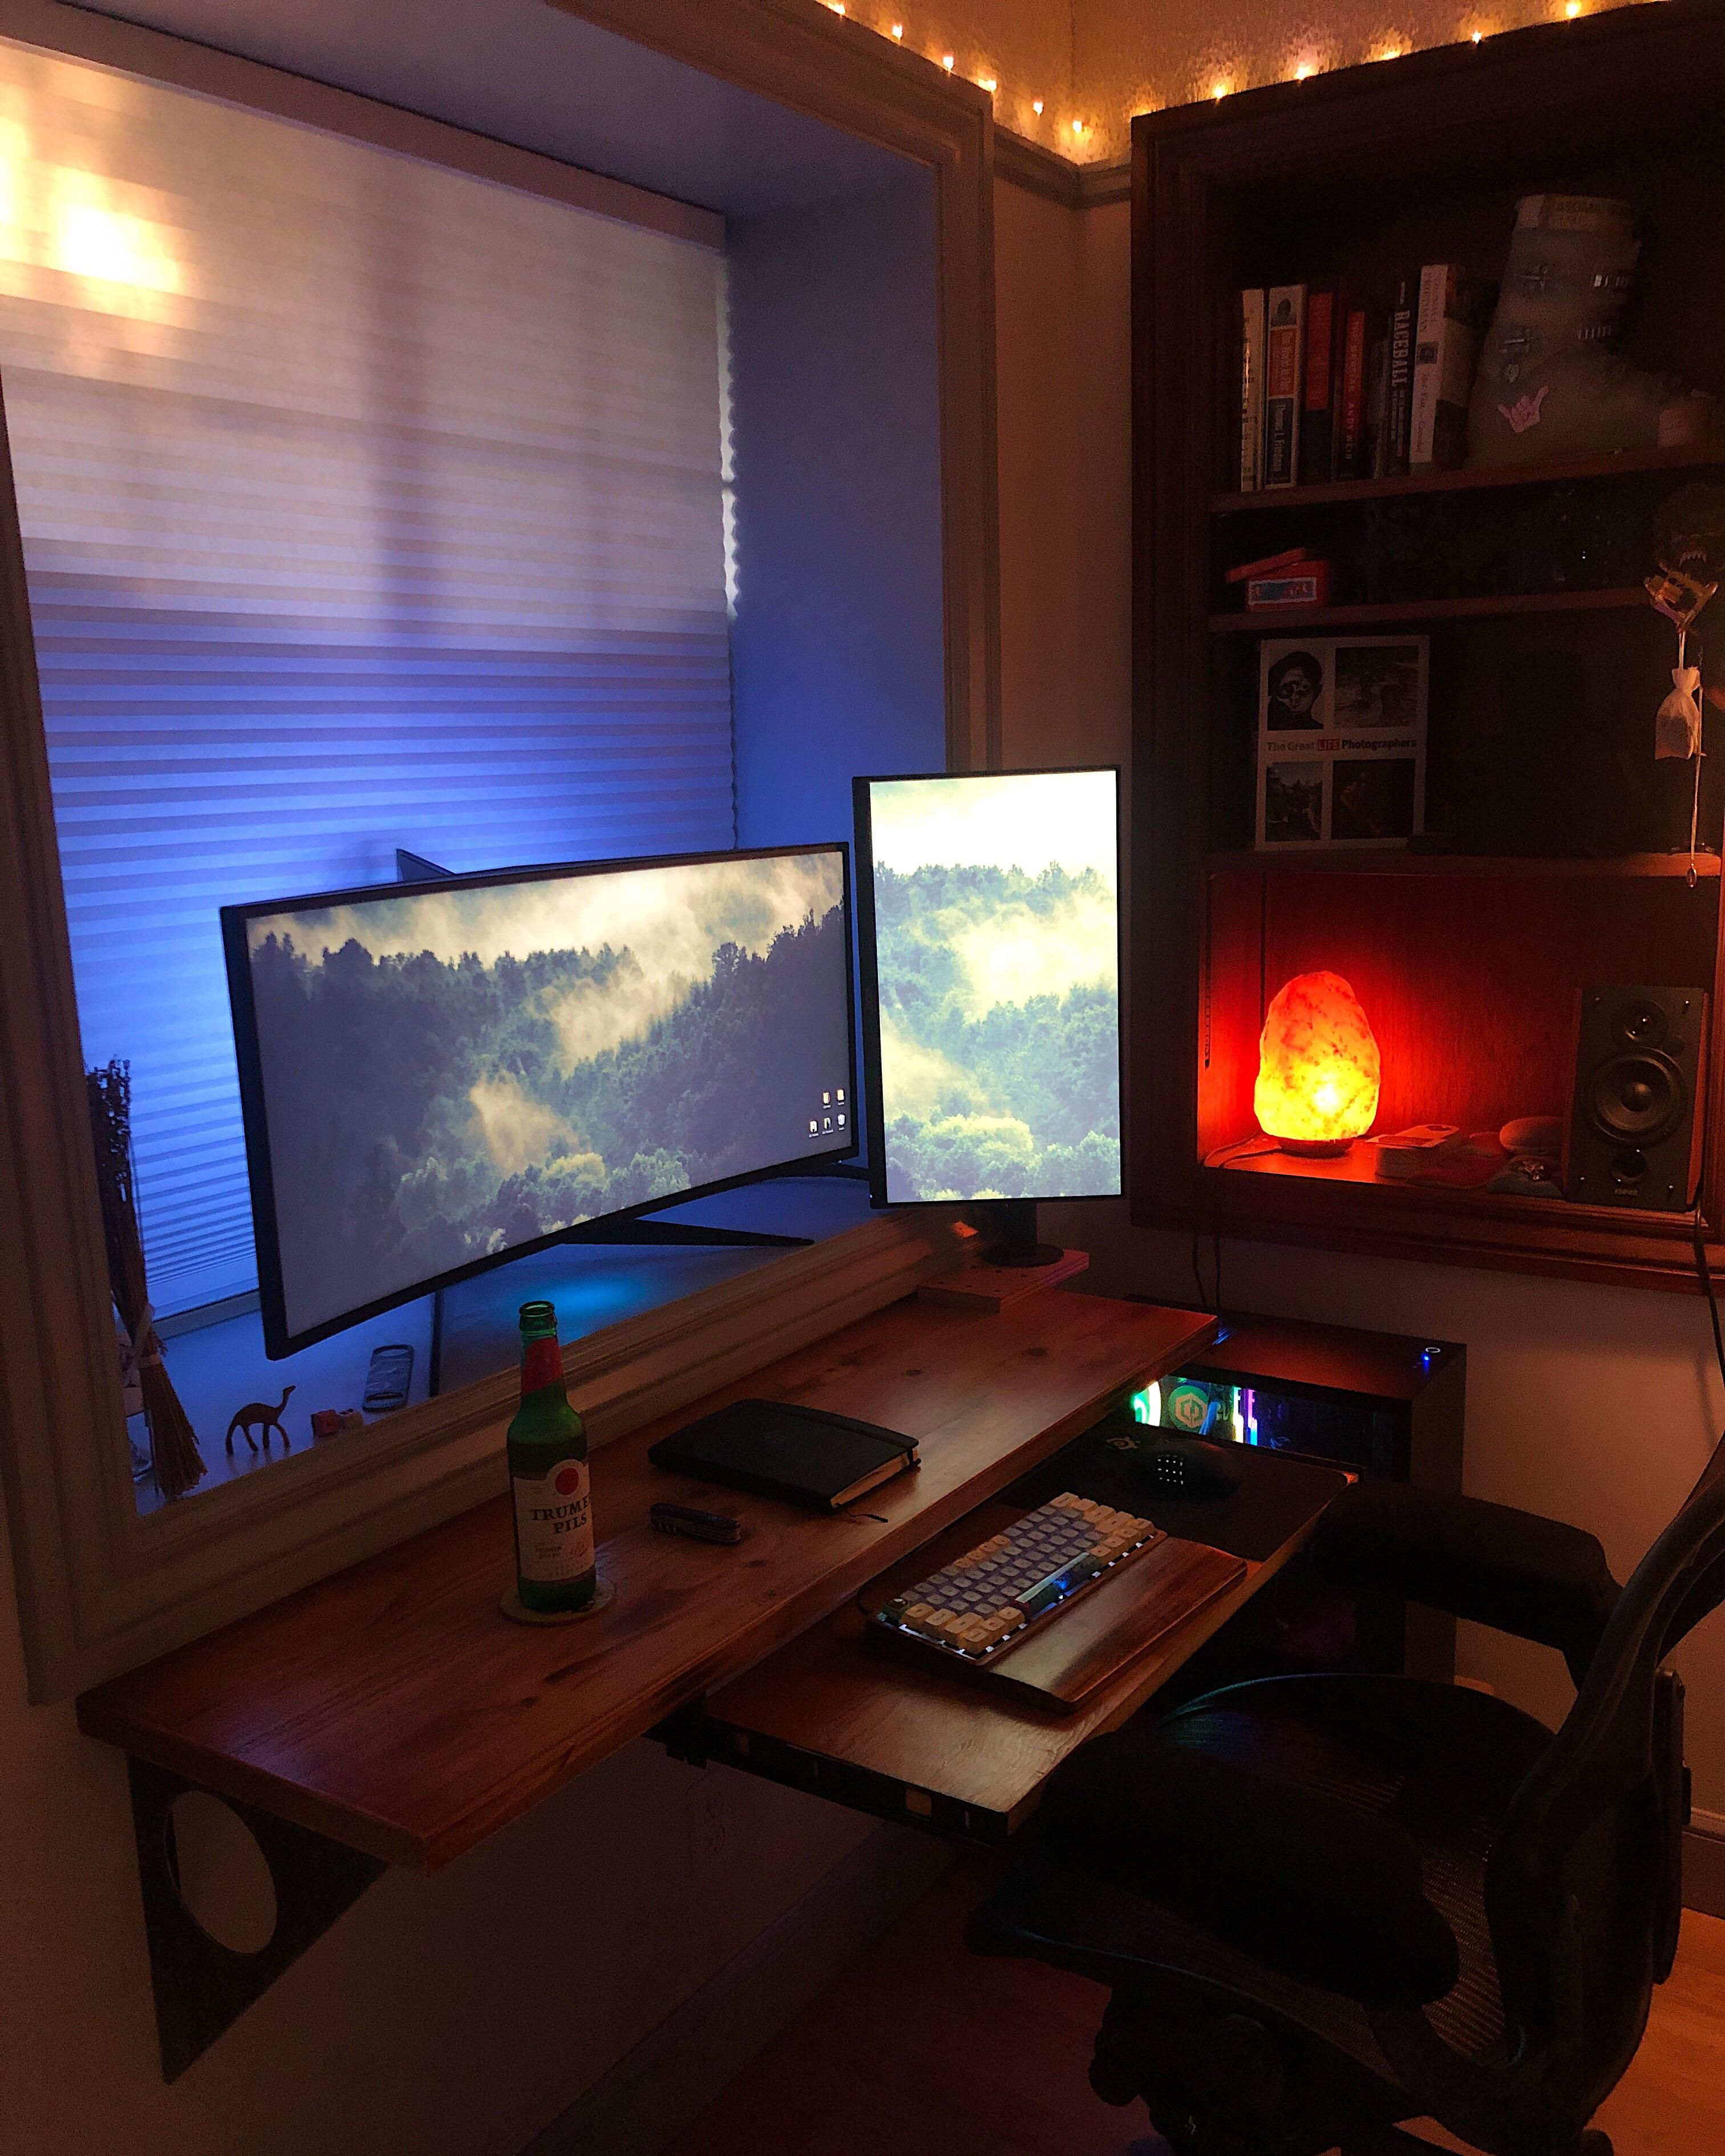 Update. Built a keyboard tray... Computer setup